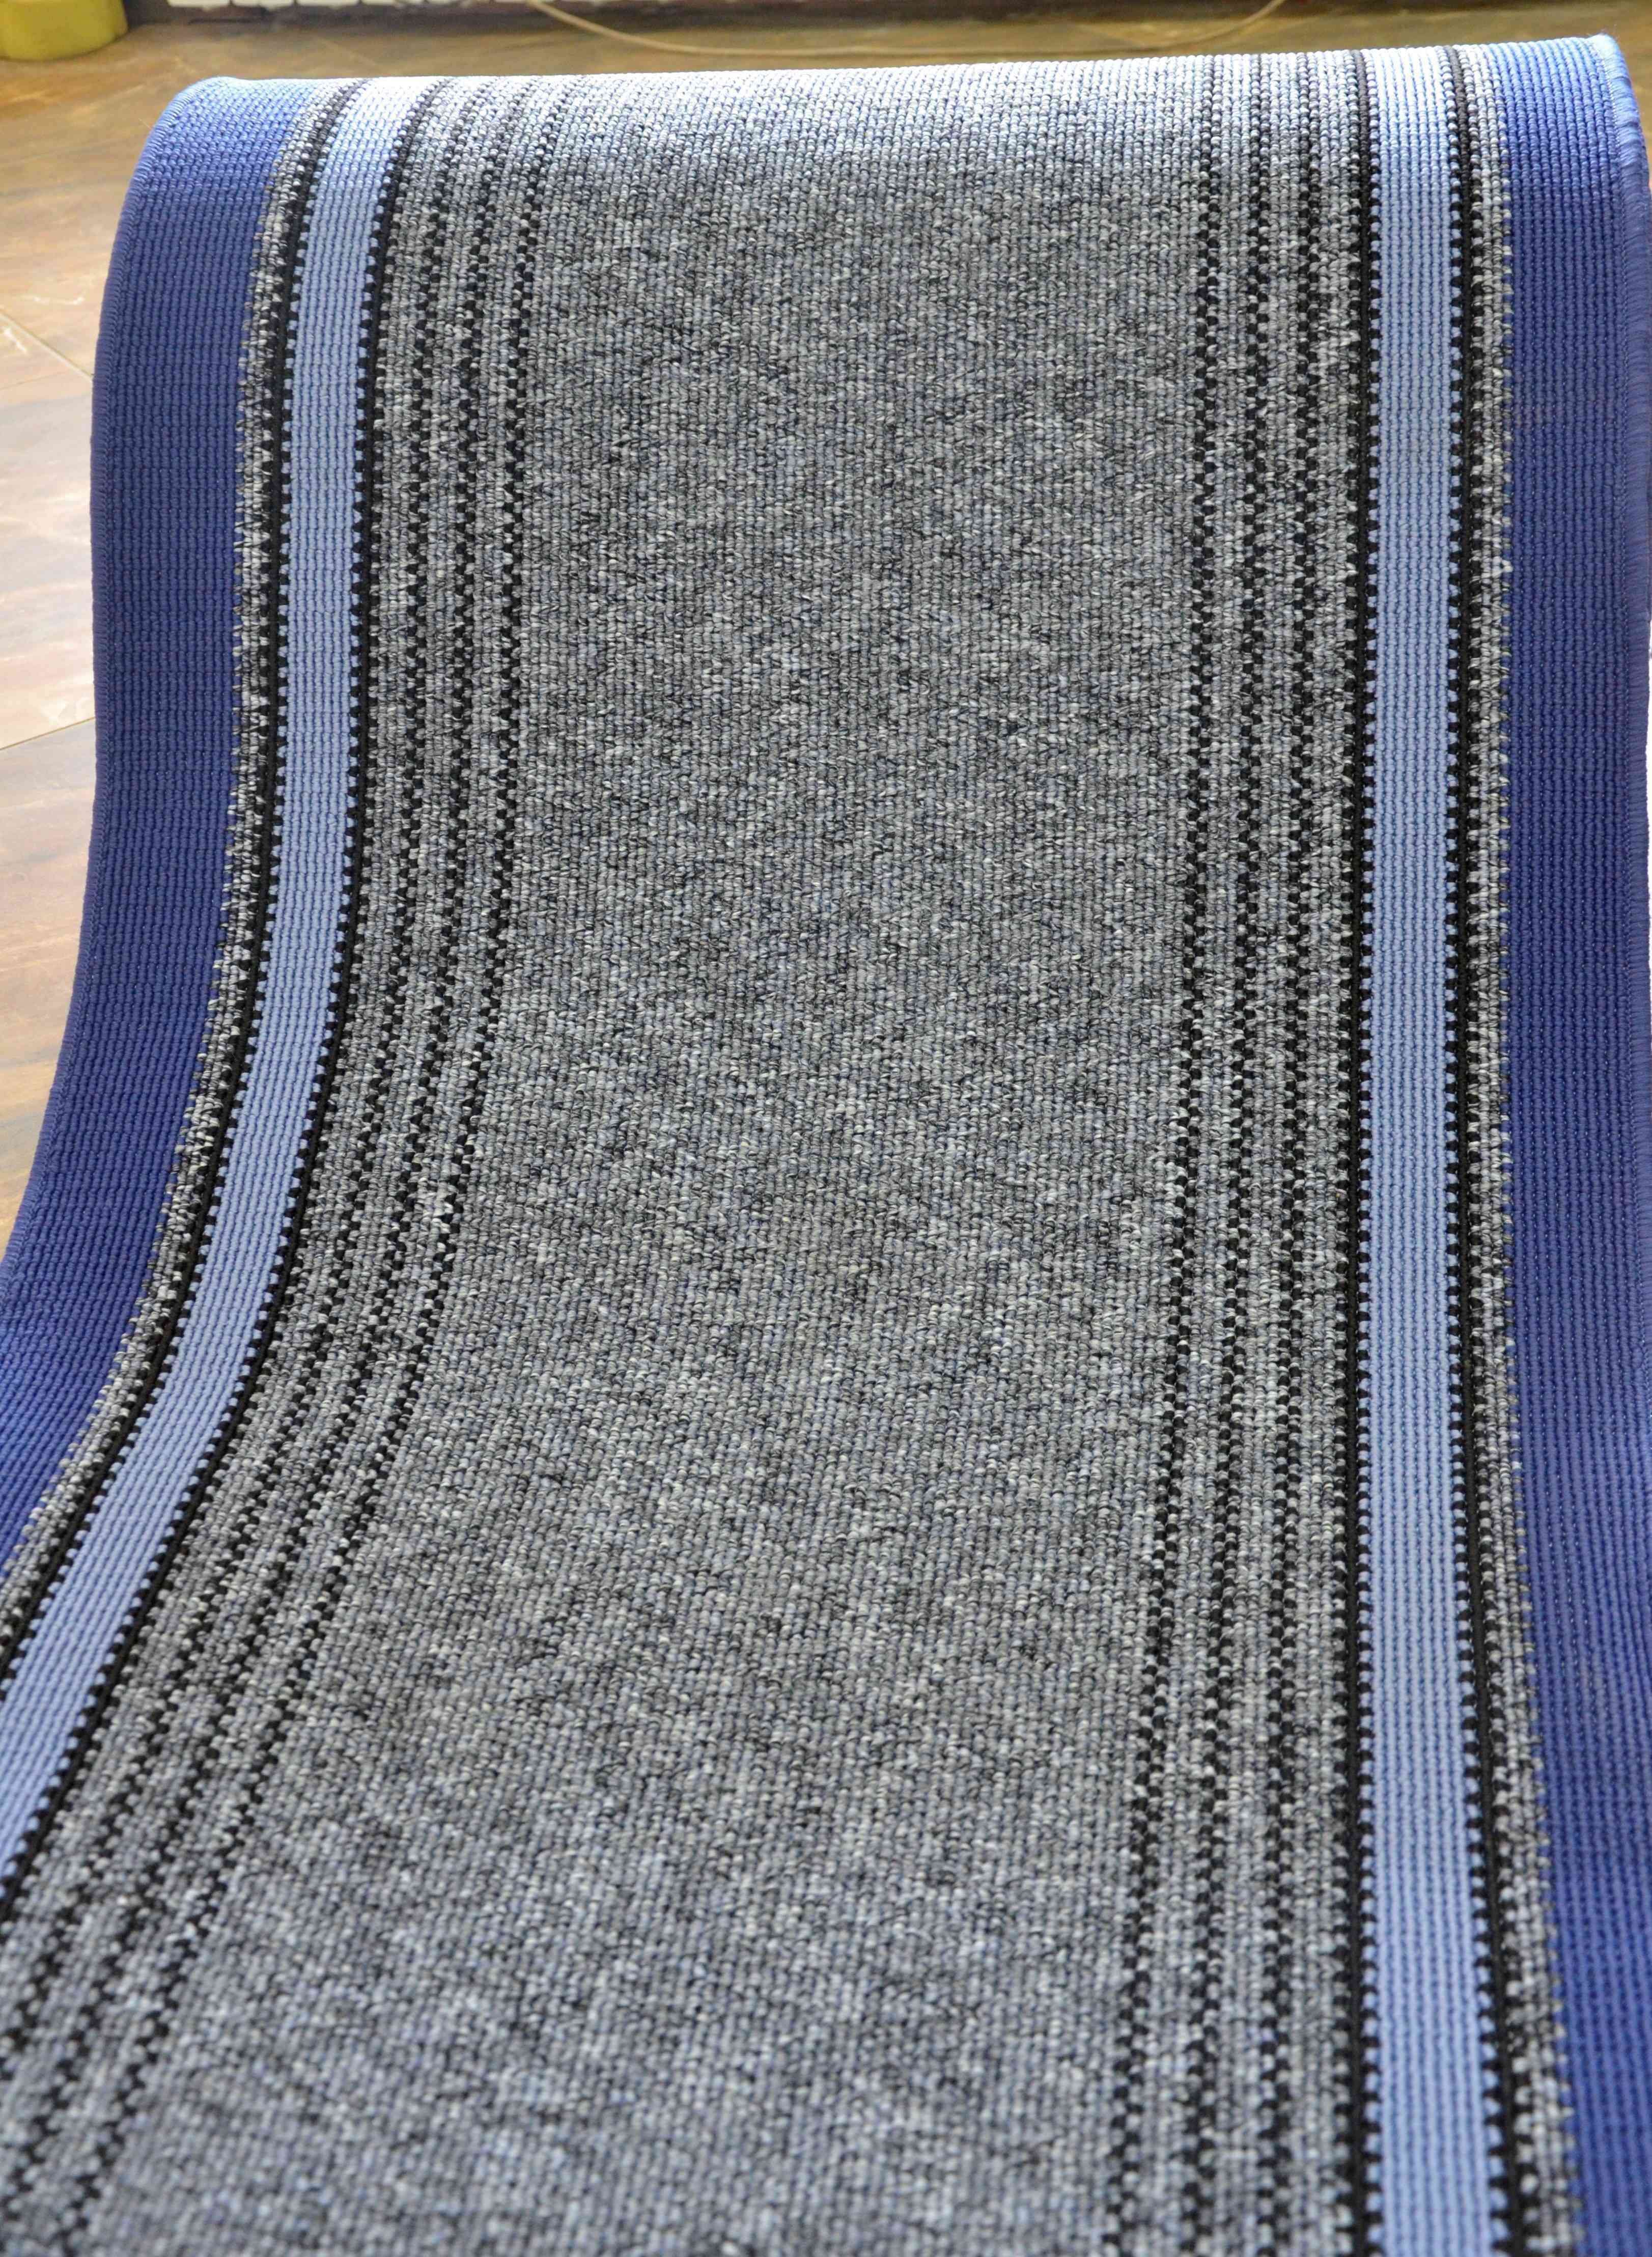 Traversa Covor, Saba 08, Albastru, 100x900 cm, 1350 gr/mp, 1x9 m 4